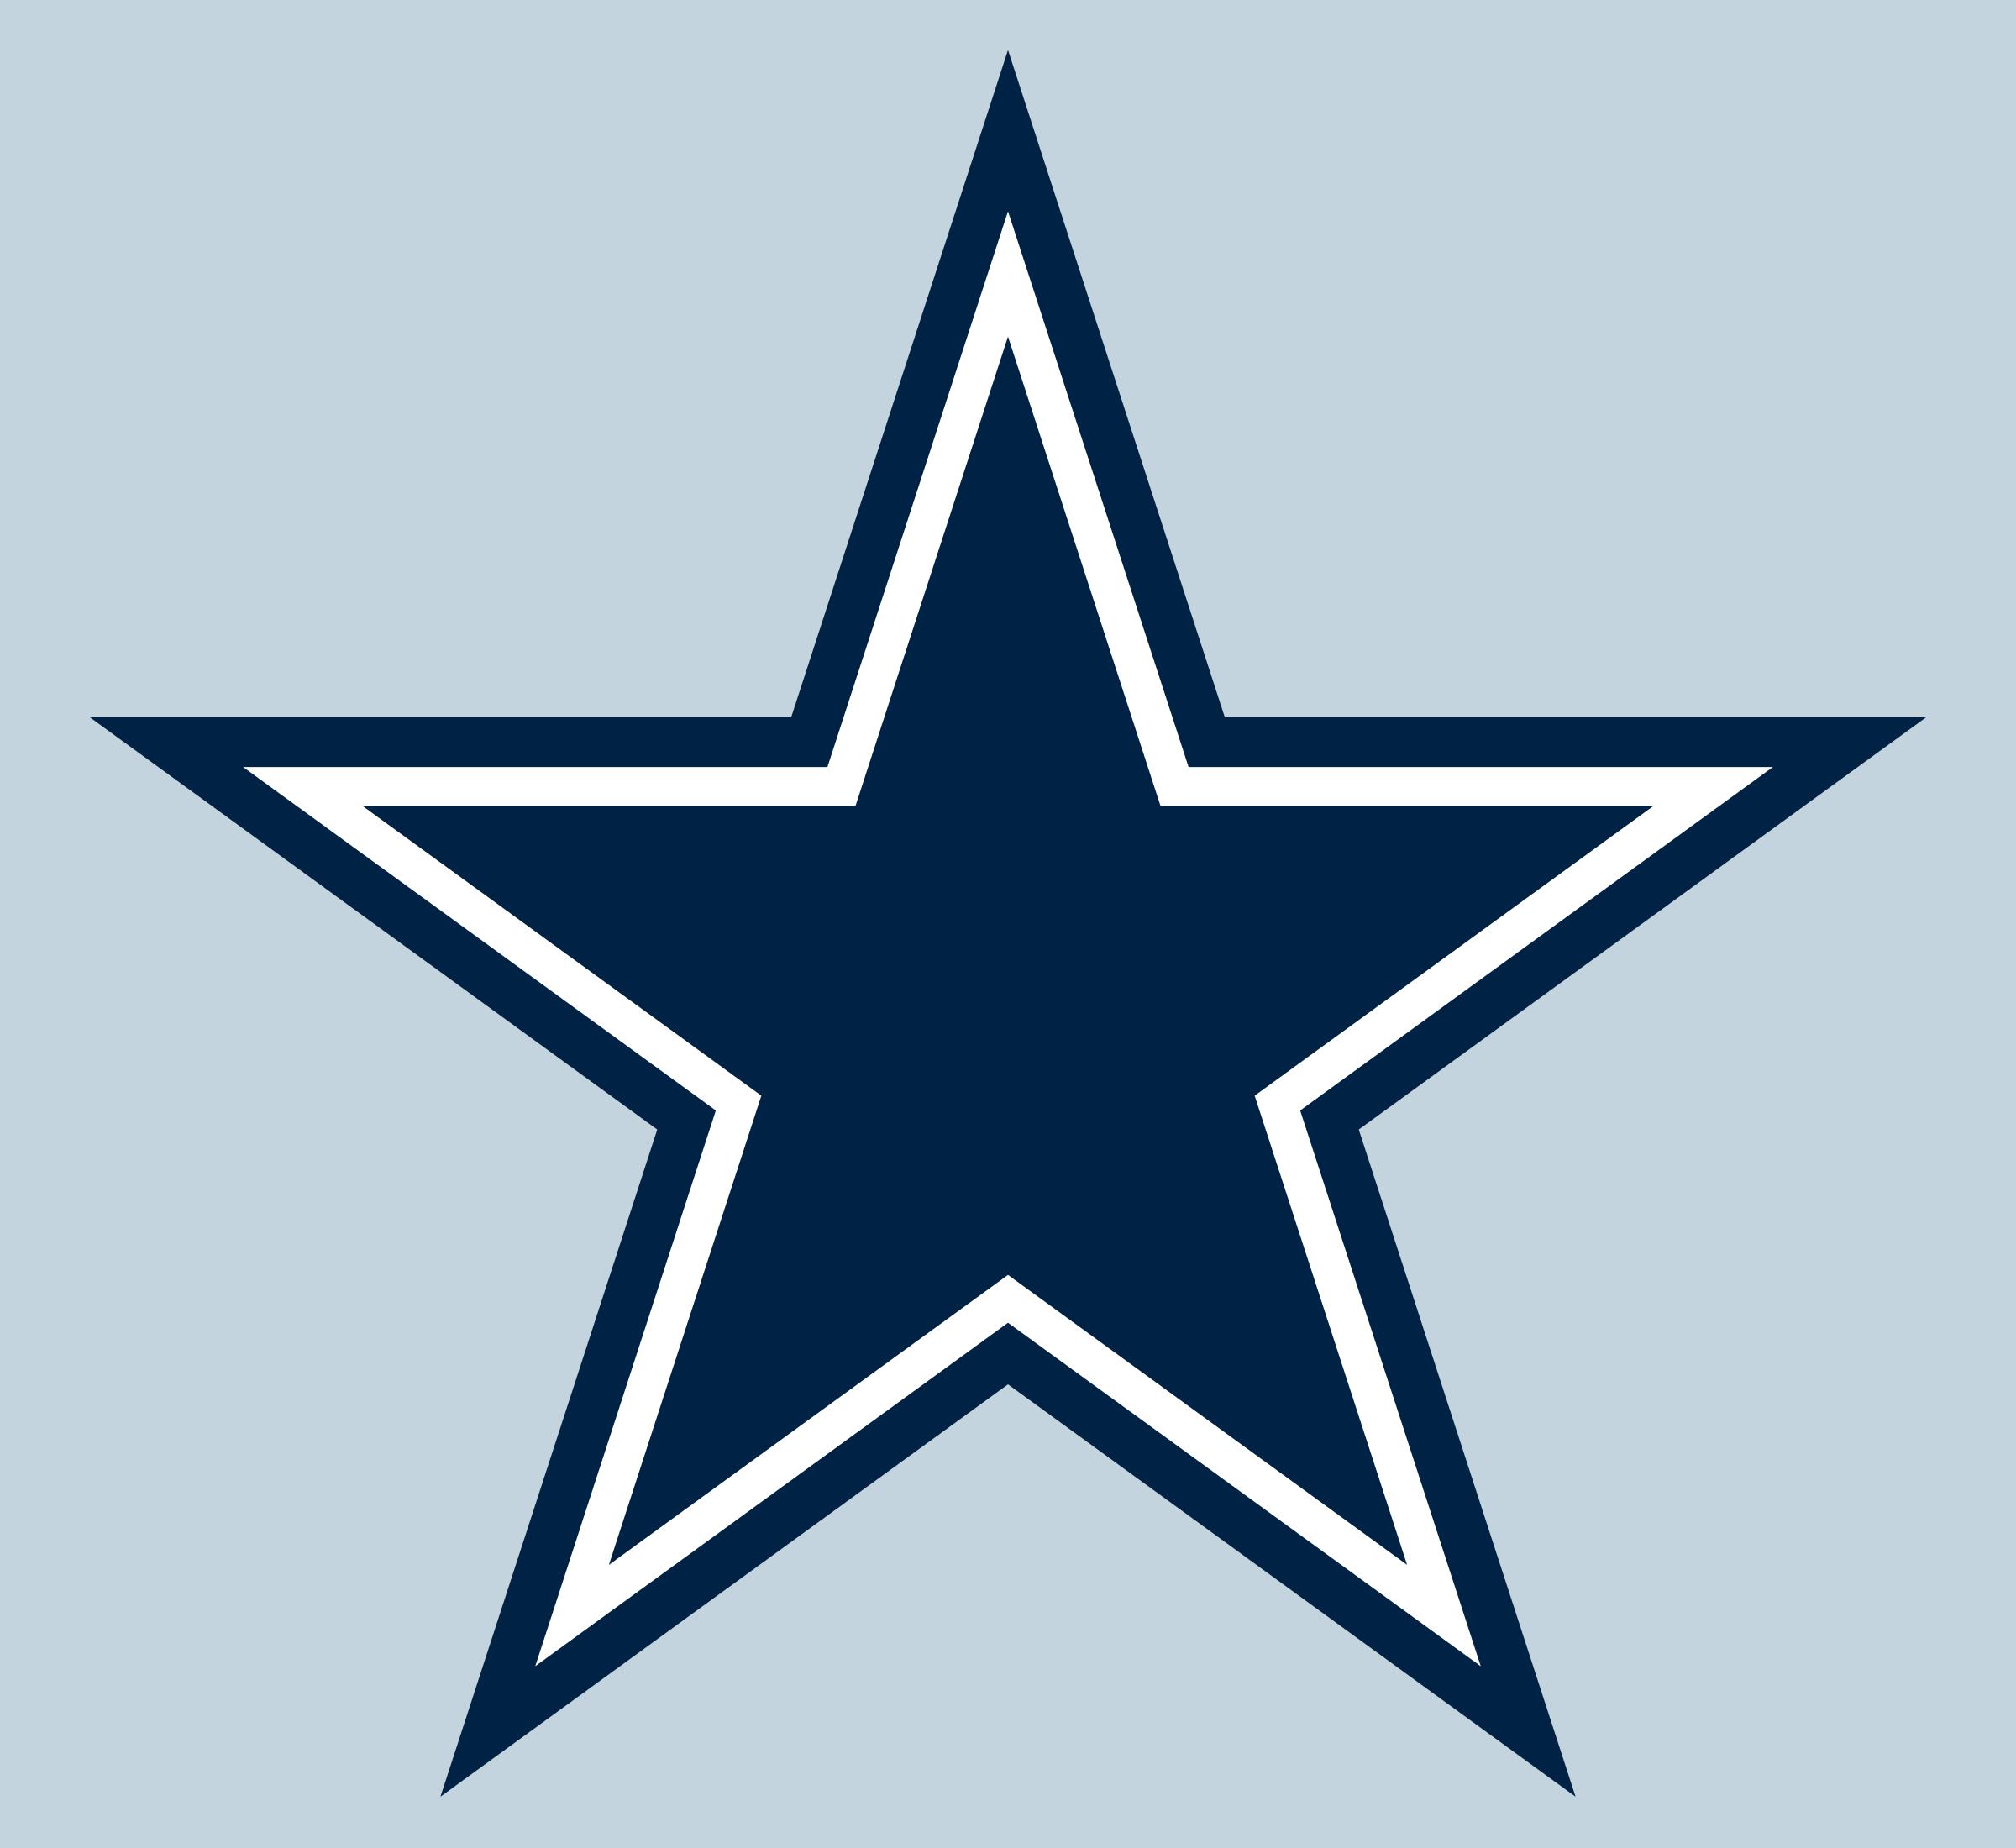 Dallas Cowboys Logo Png Transparent Svg Vector Freebie Supply